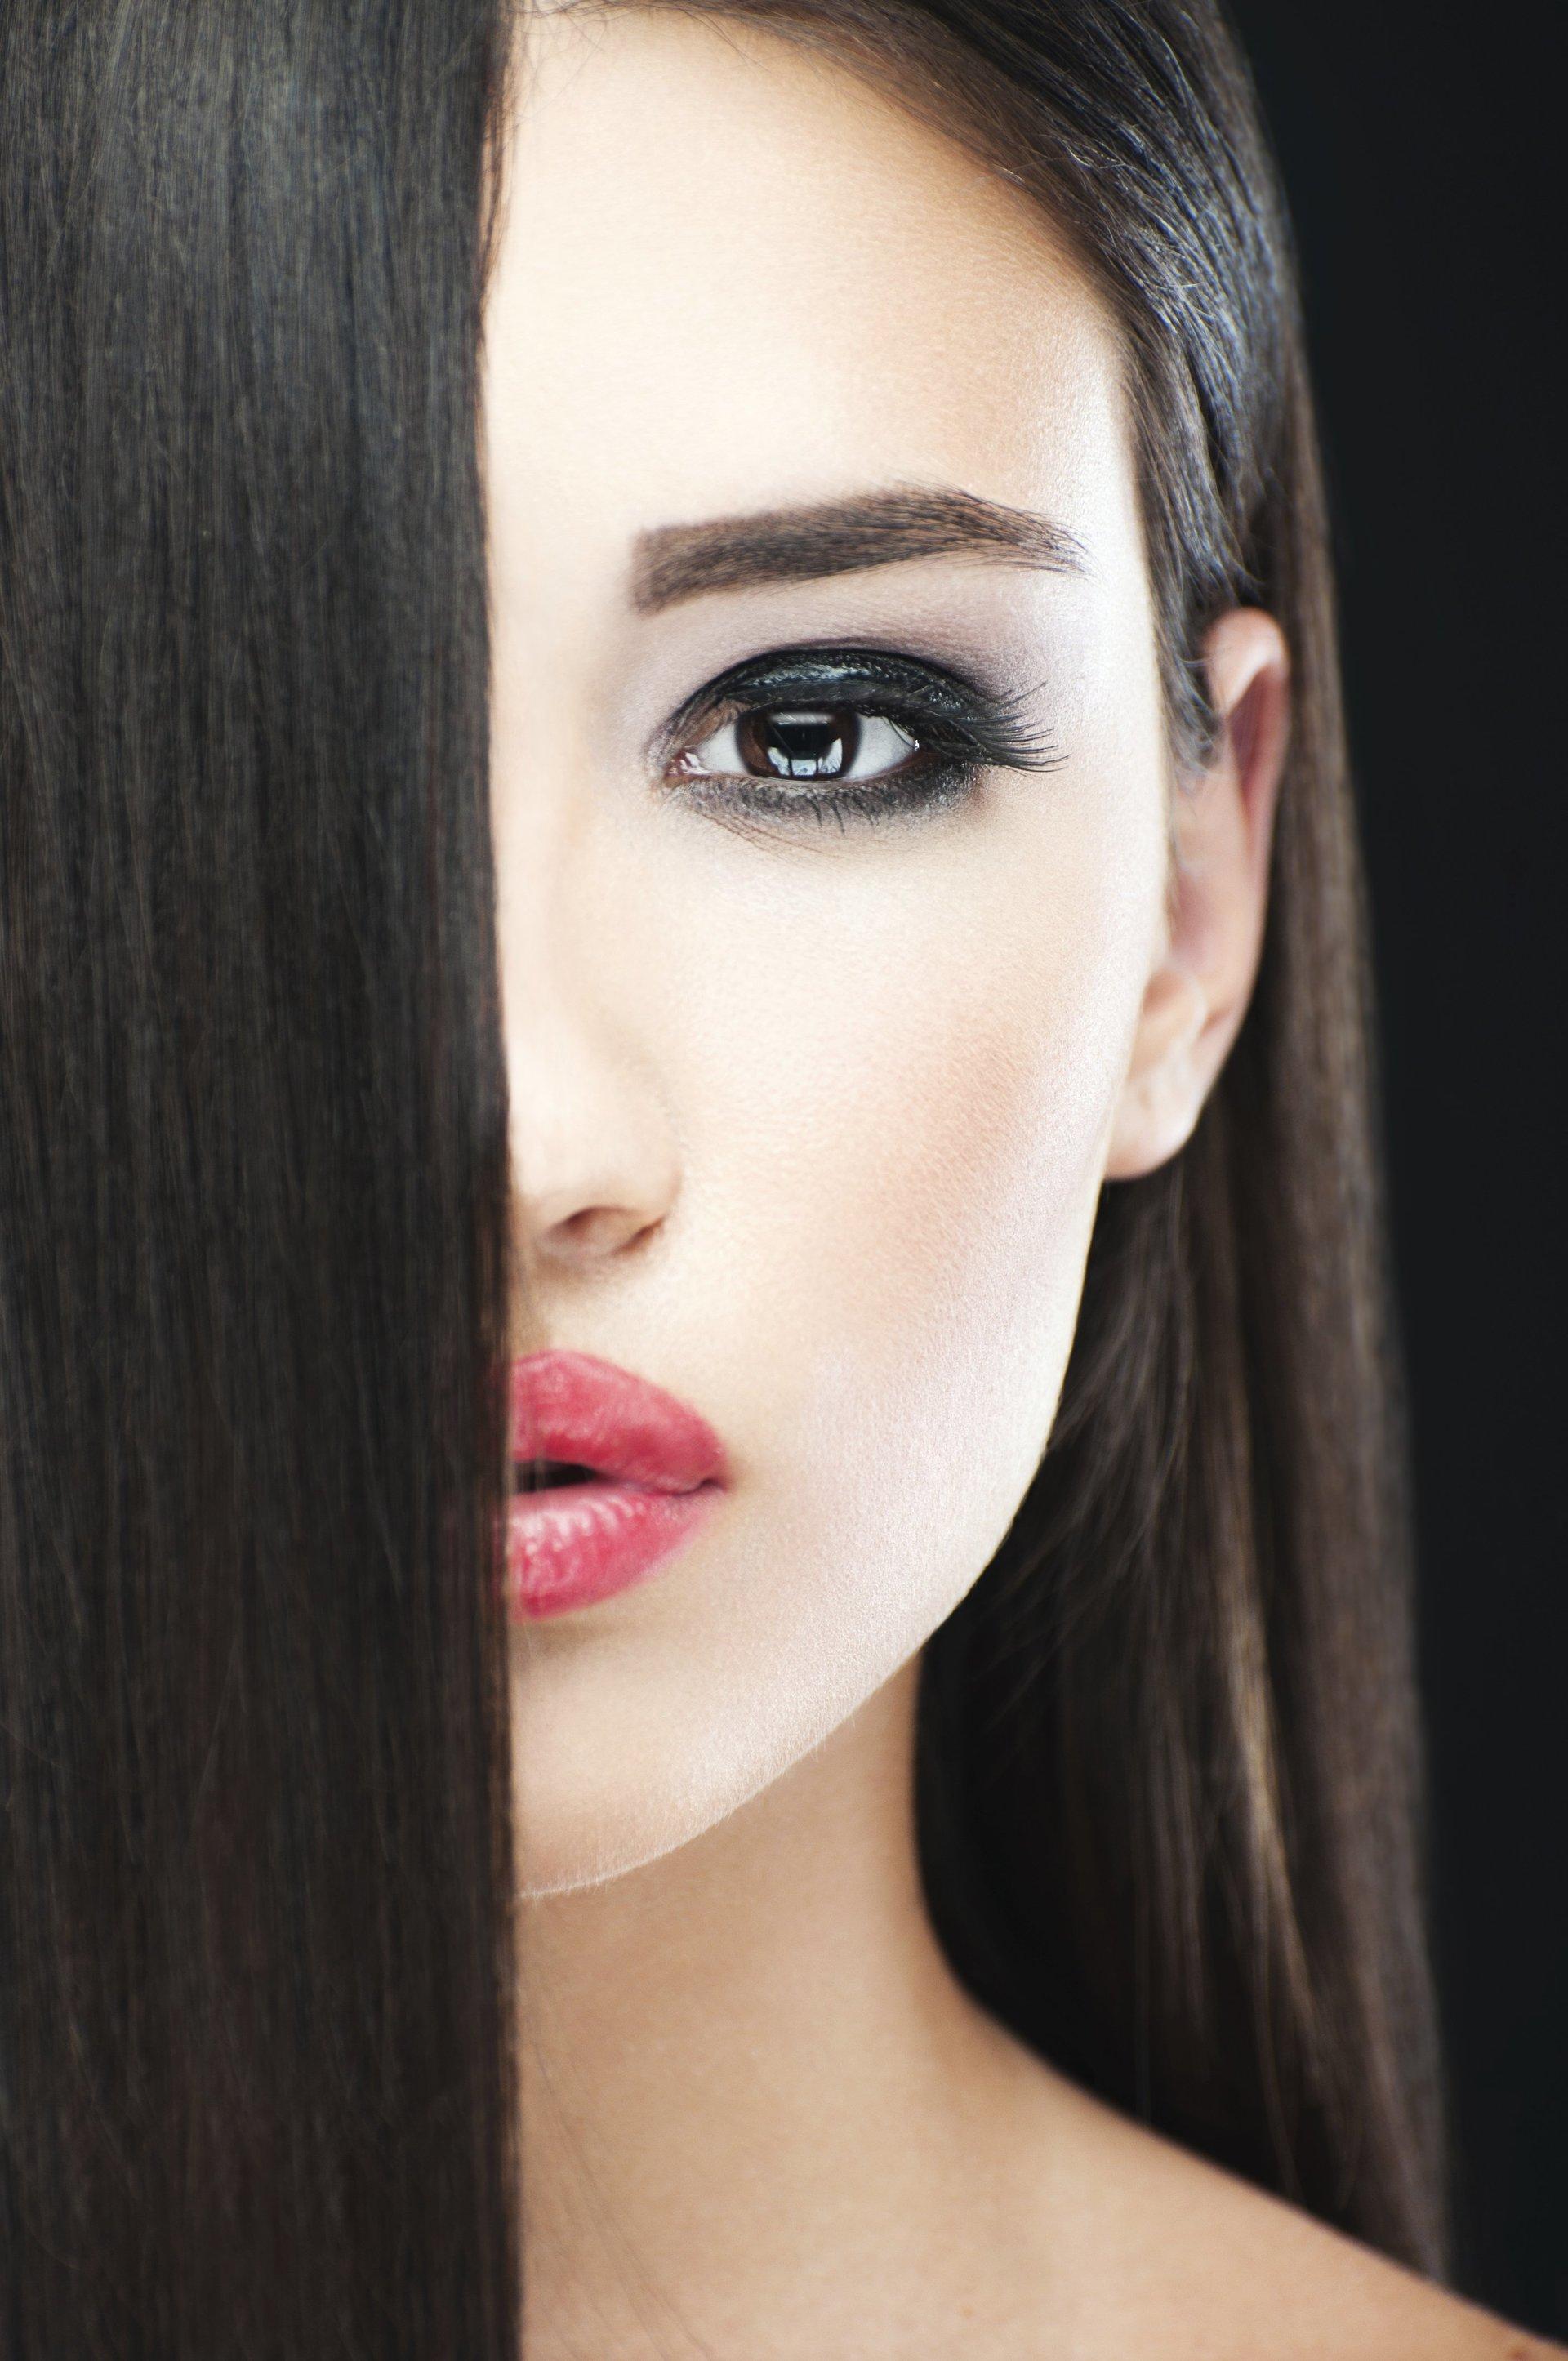 Lisciatura dei capelli lunghi